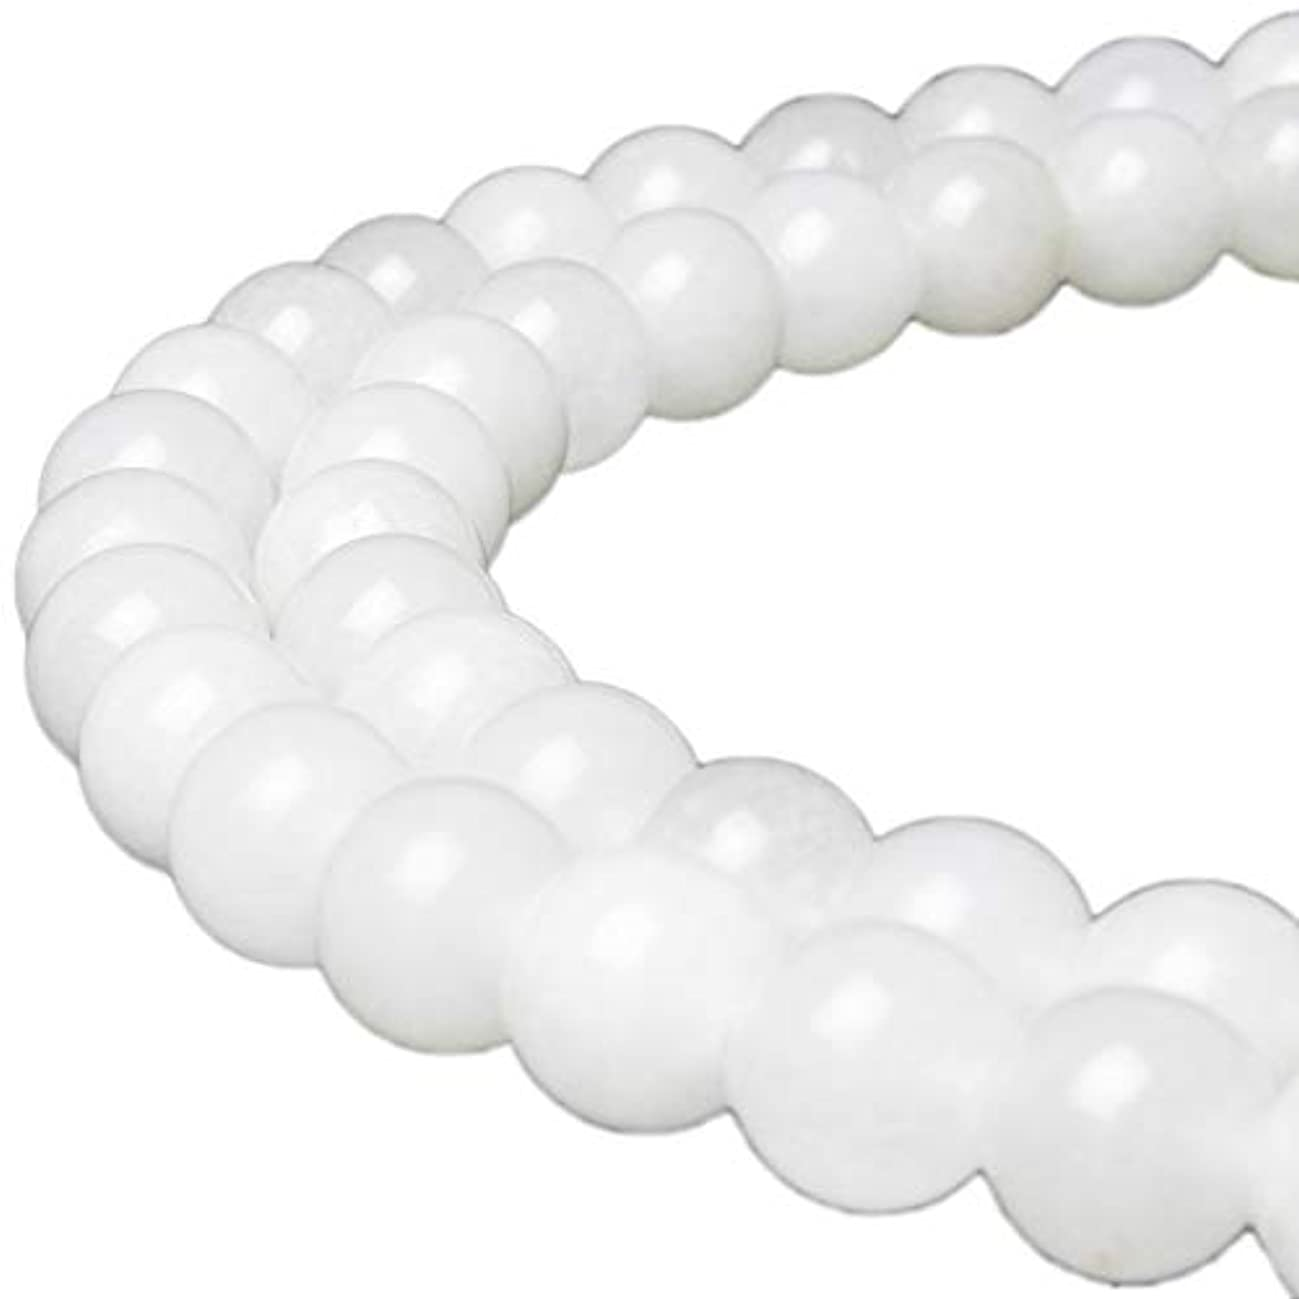 JARTC Natural White Jade Gemstone Loose Beads Round 10mm Energy Stone Healing Power for Jewelry Making